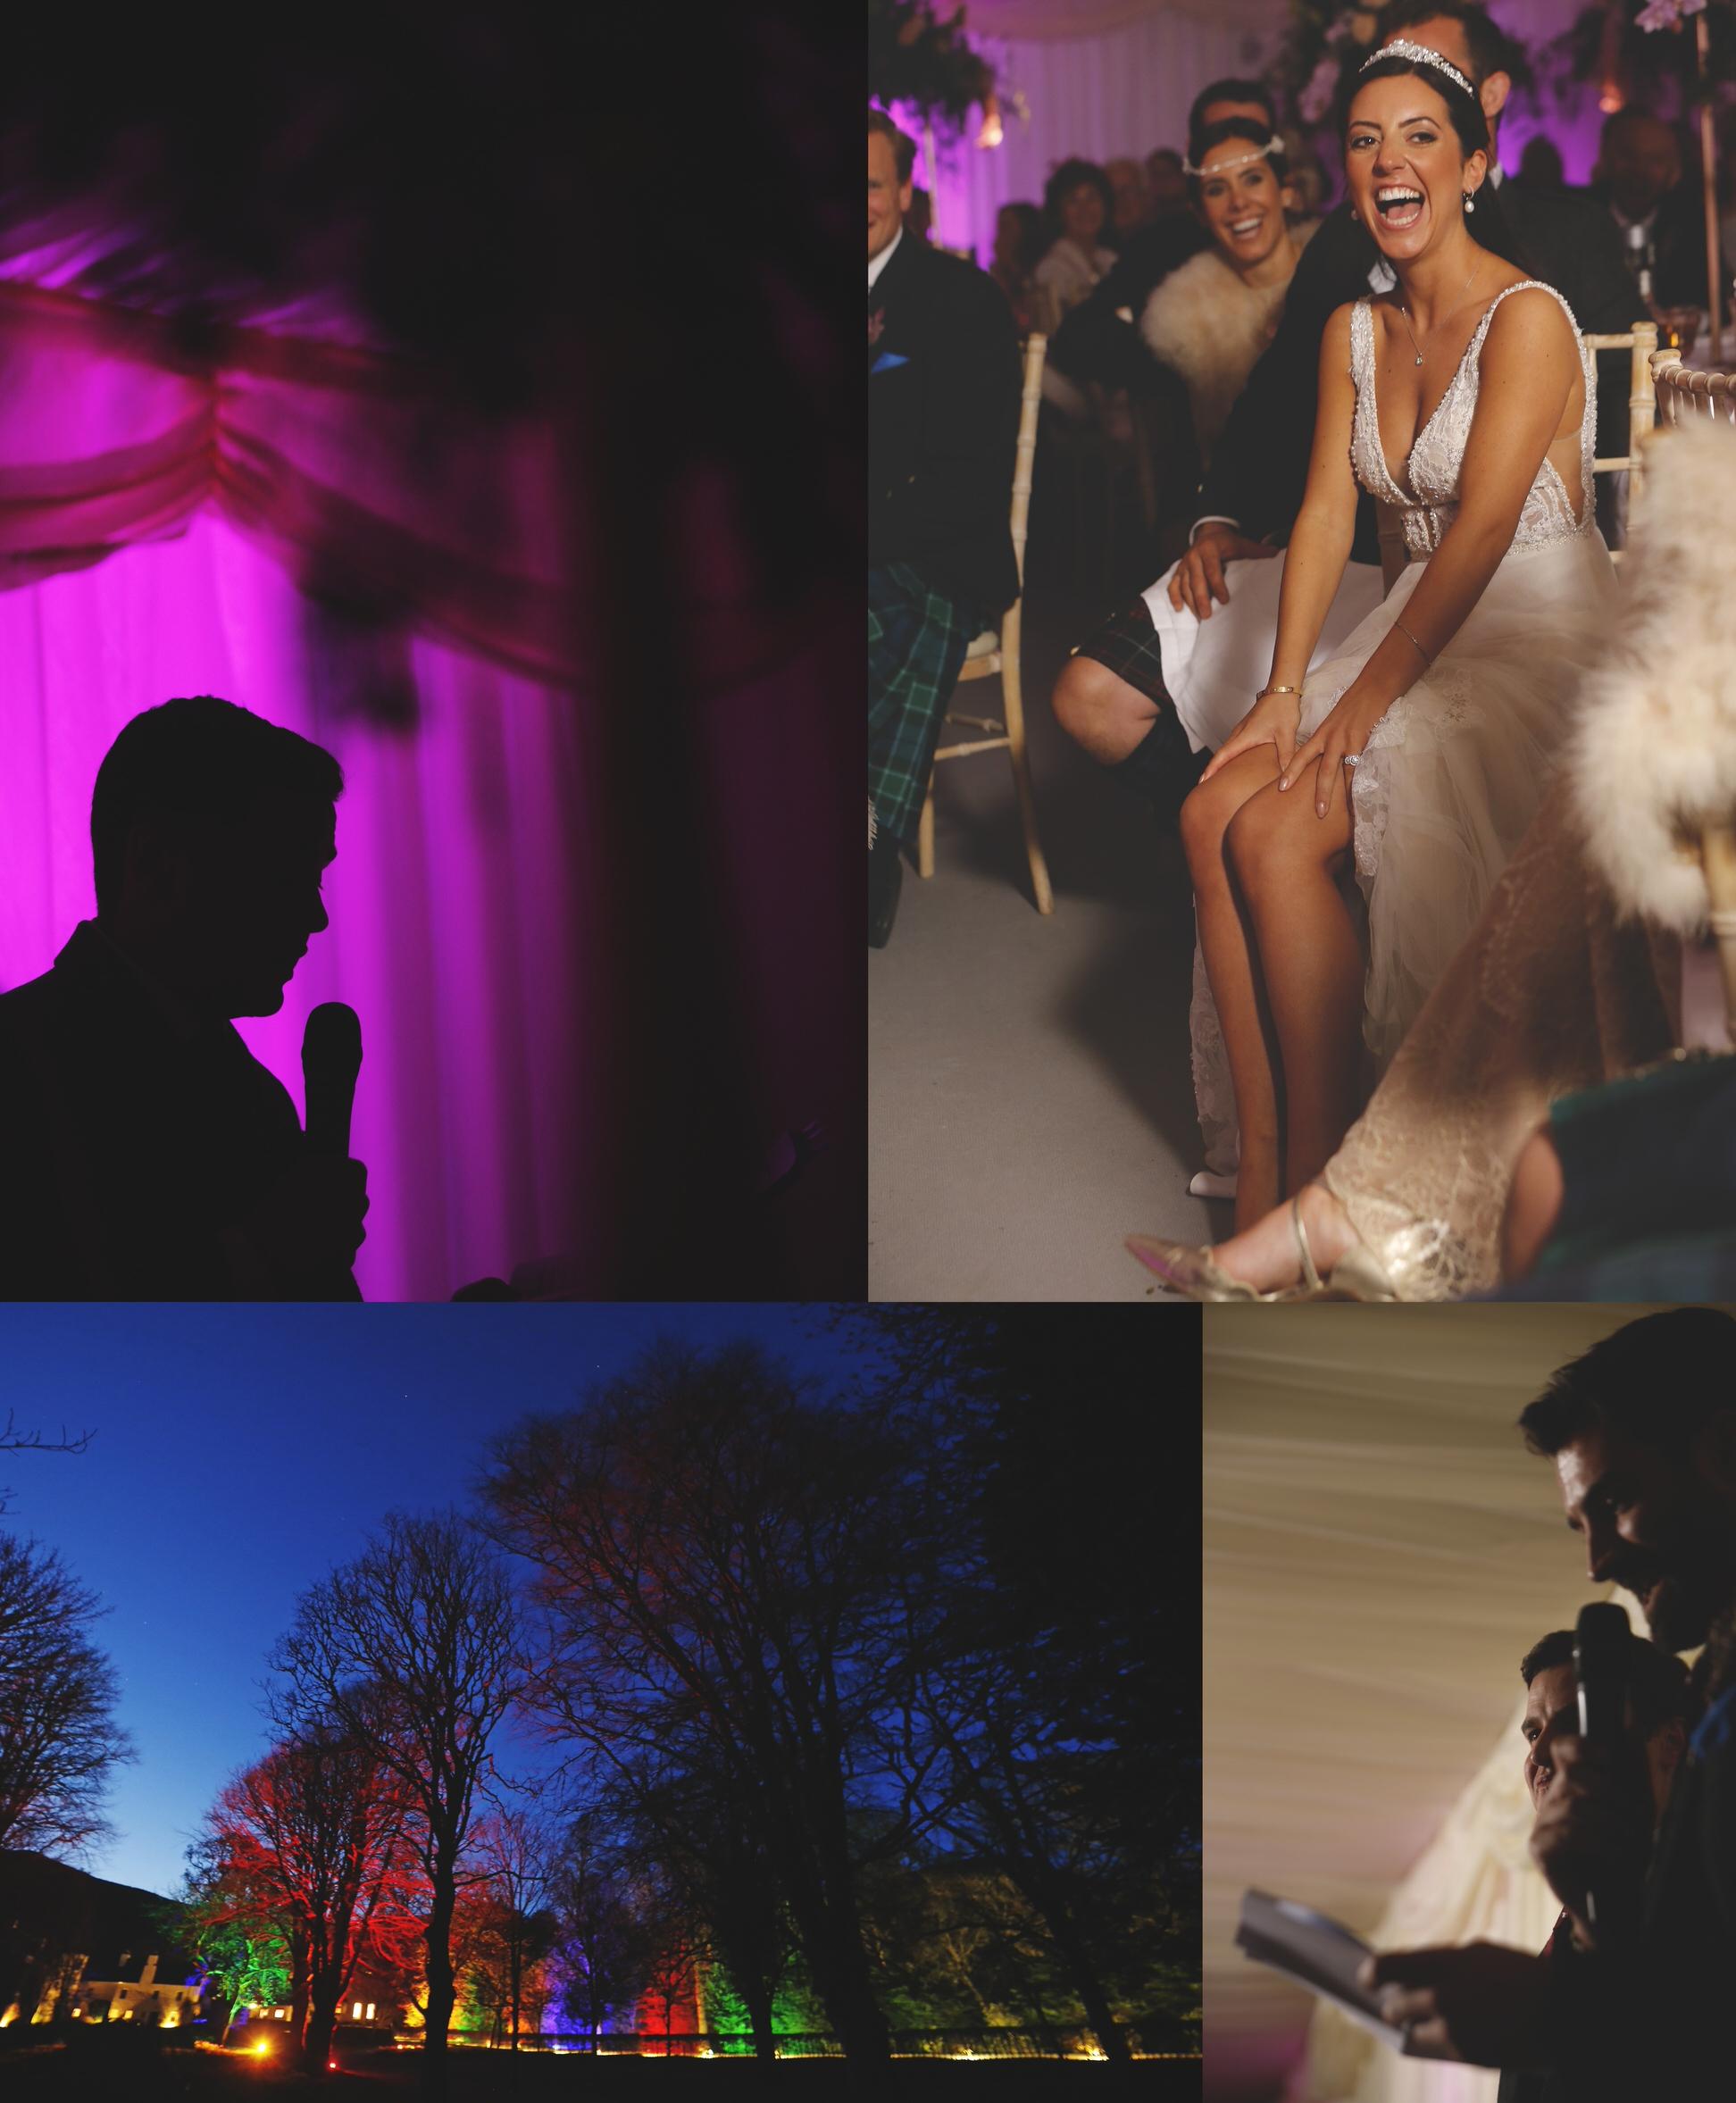 brett-harkness-cotland-wedding-photographer-highland-wedding_0033.jpg